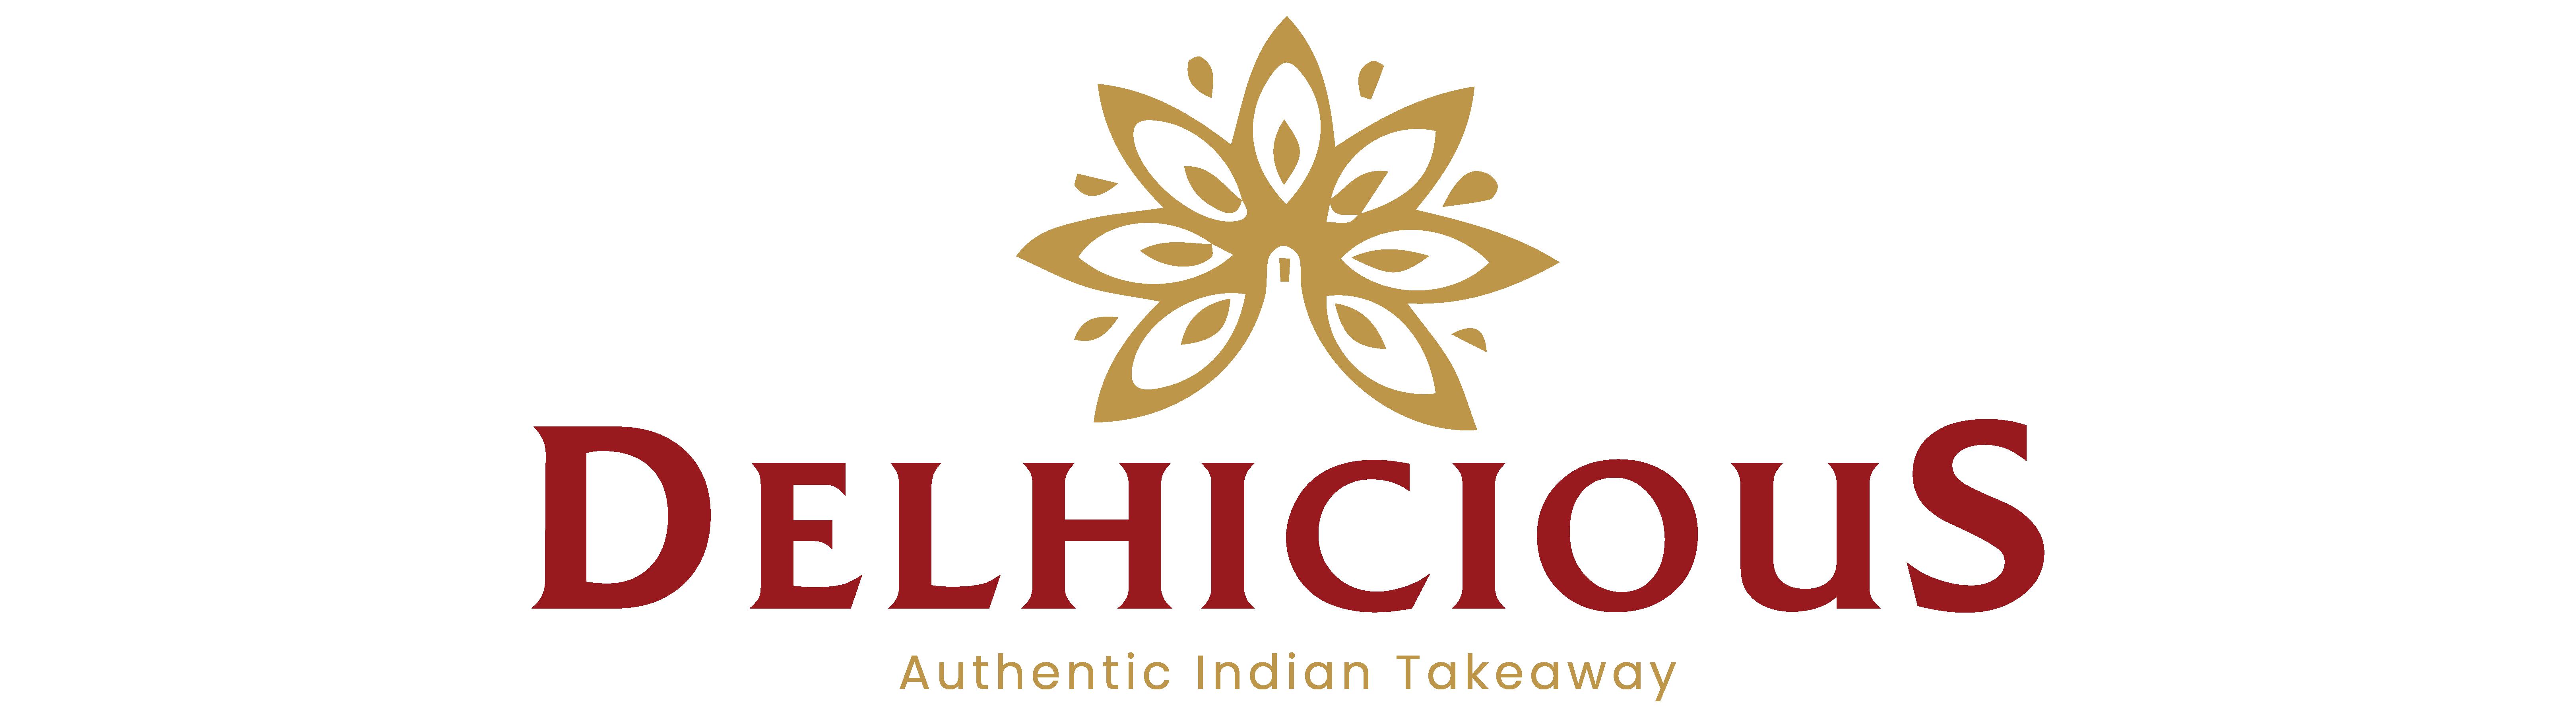 Delhicious_logo